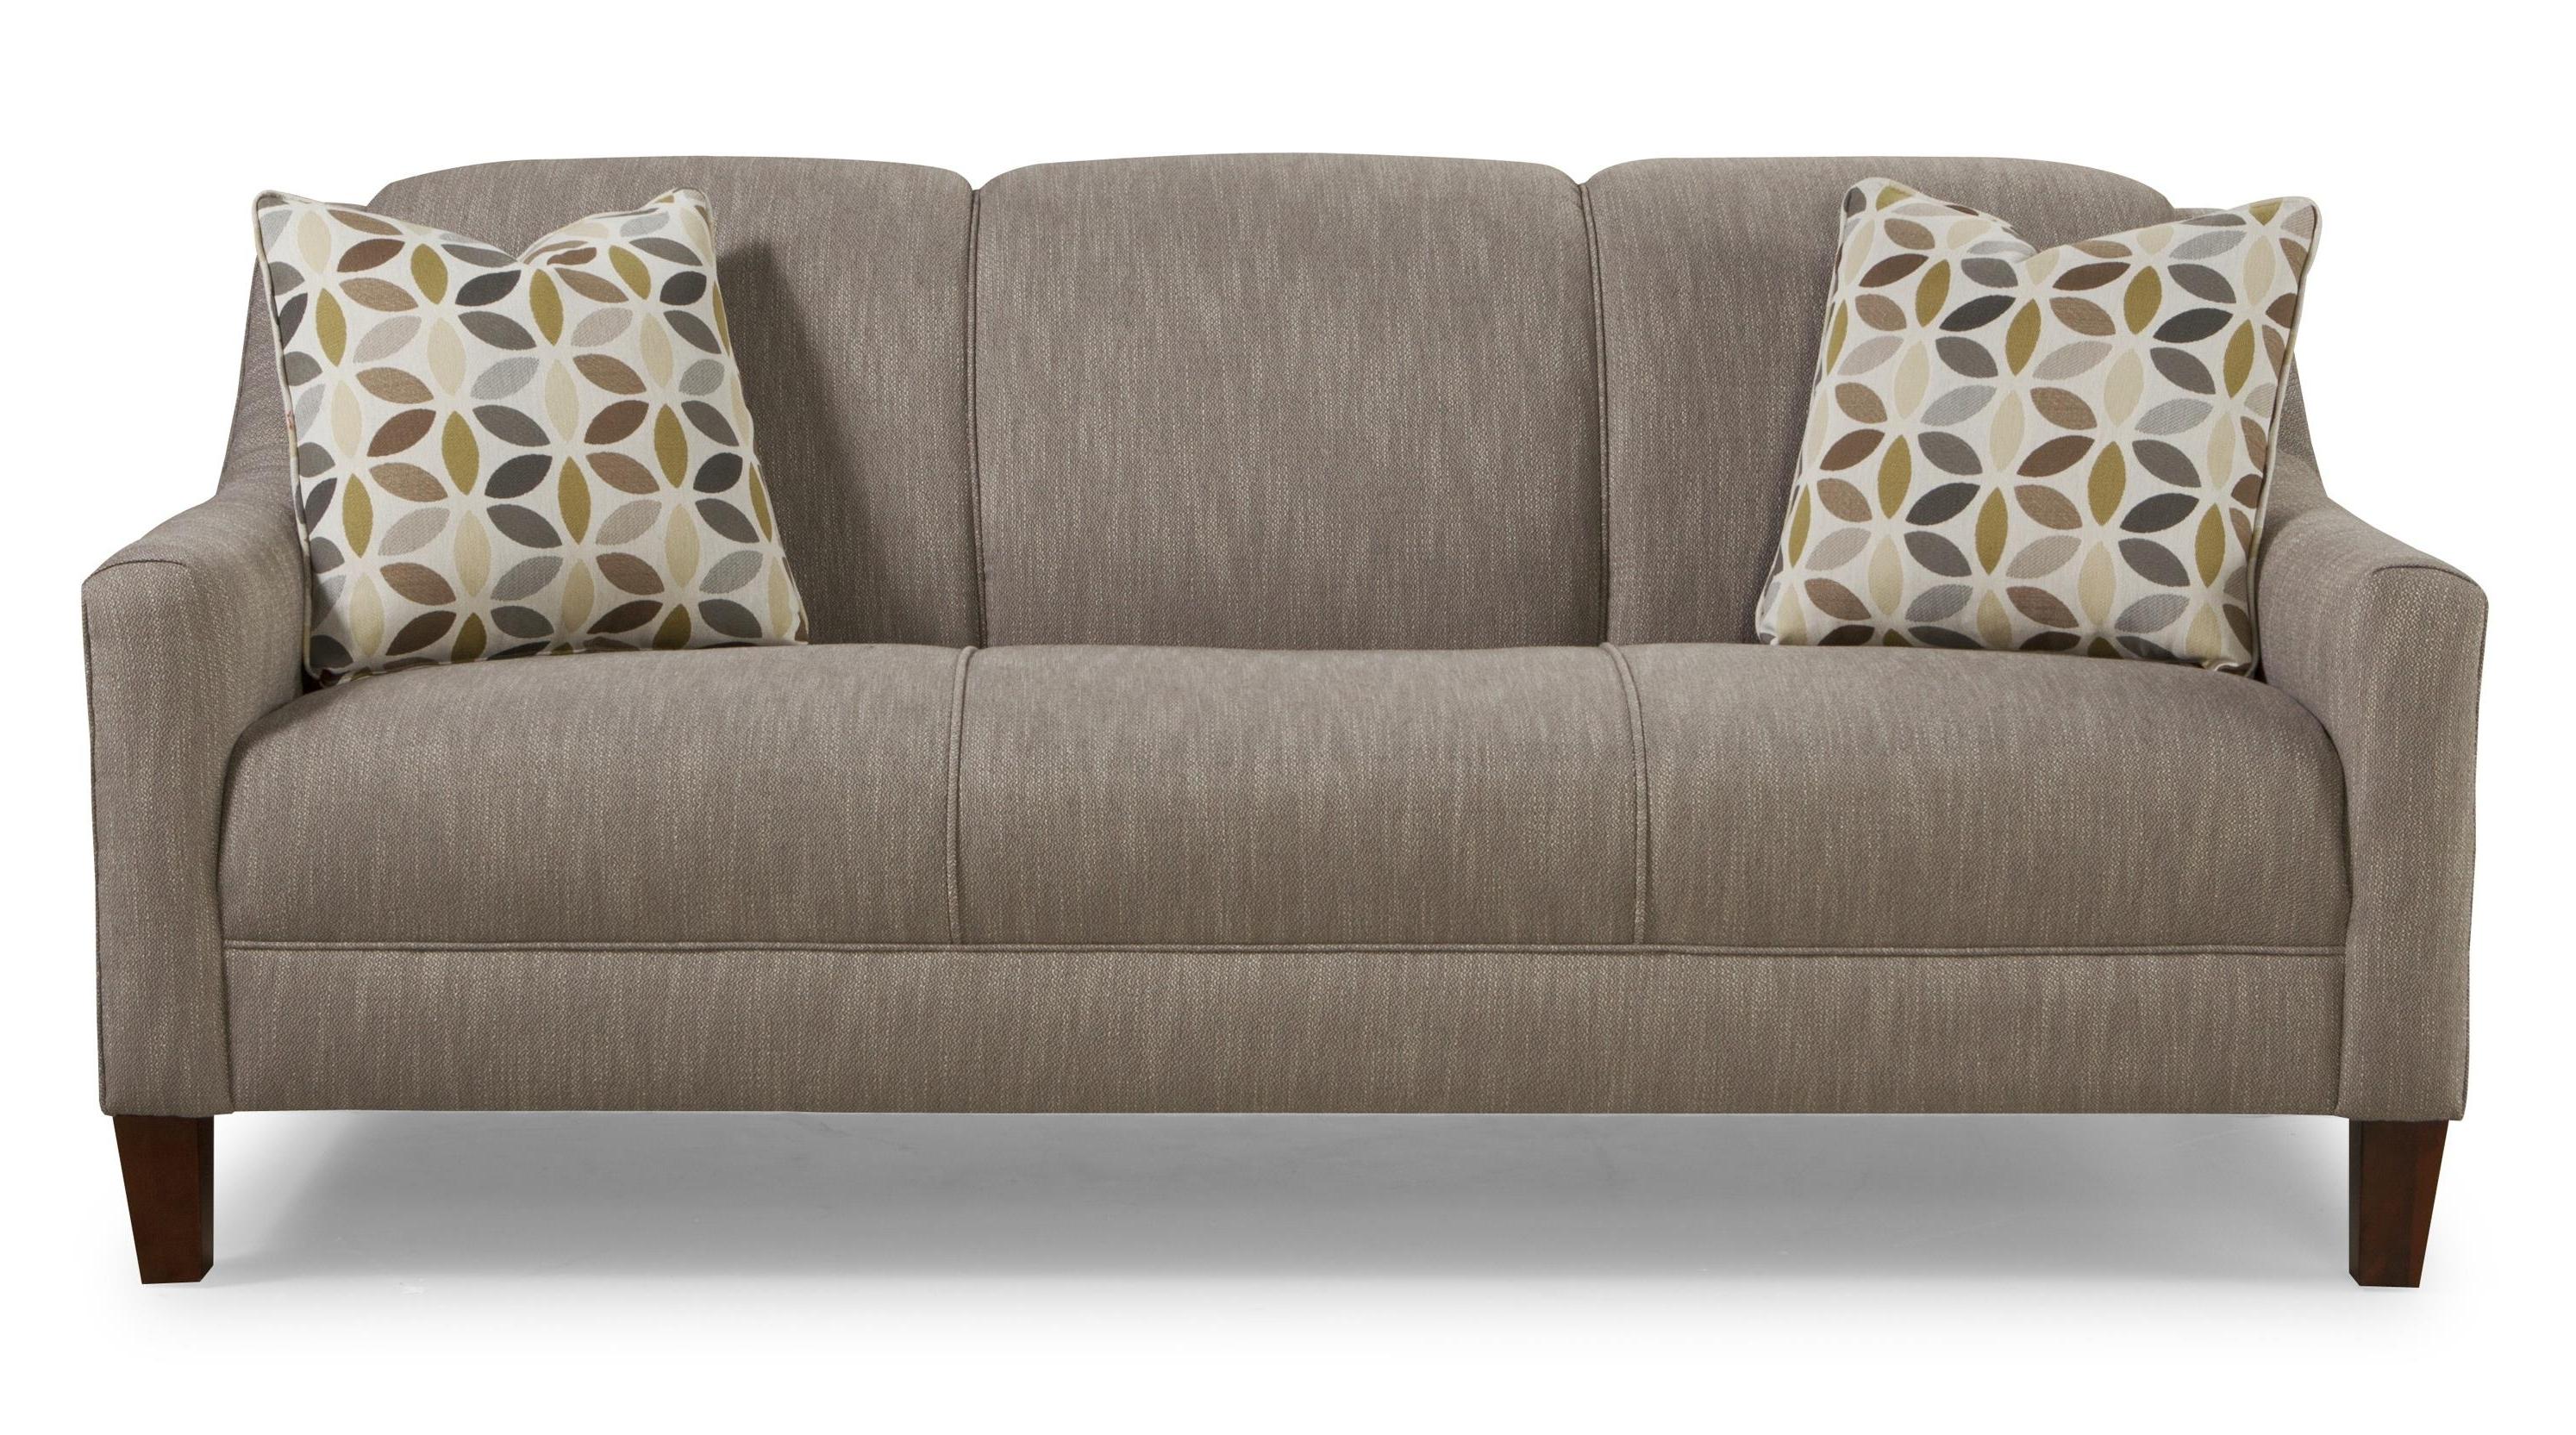 Apartment Size Sofas Regarding Newest Sofa: Stylish Apartment Size Sofas Small Sectionals, Sofas Under (View 2 of 20)